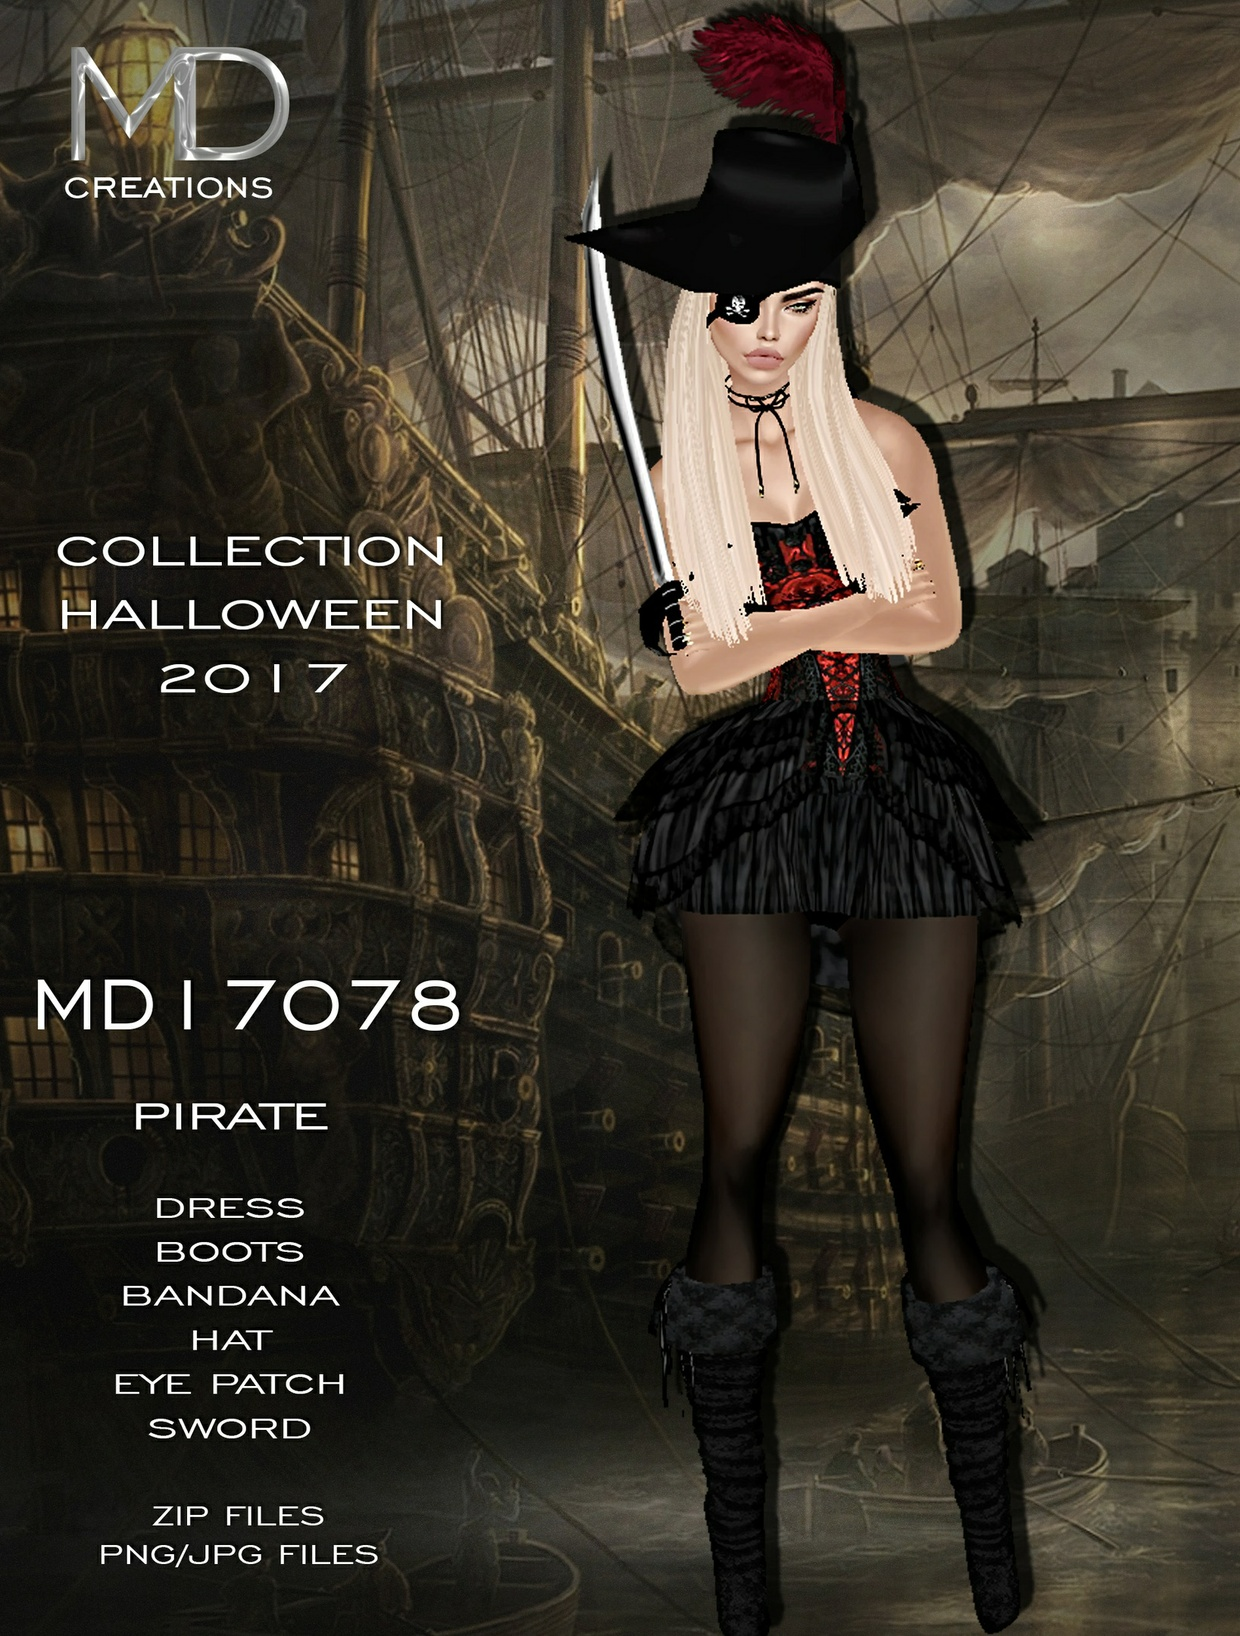 MD17078 - Halloween 2017